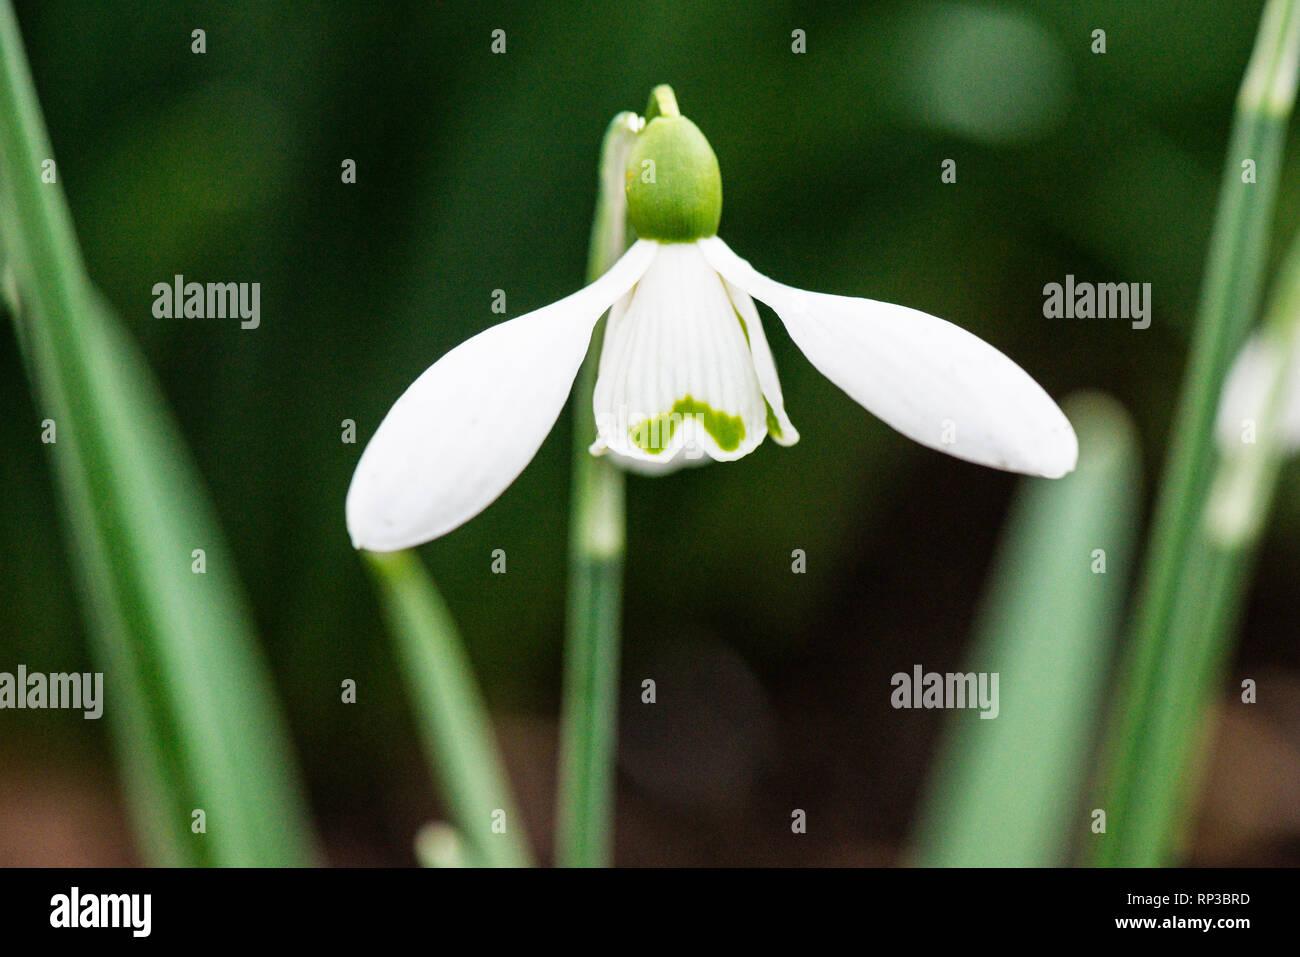 The flower of a snowdrop 'S. Arnott' (Galanthus 'S. Arnott') - Stock Image